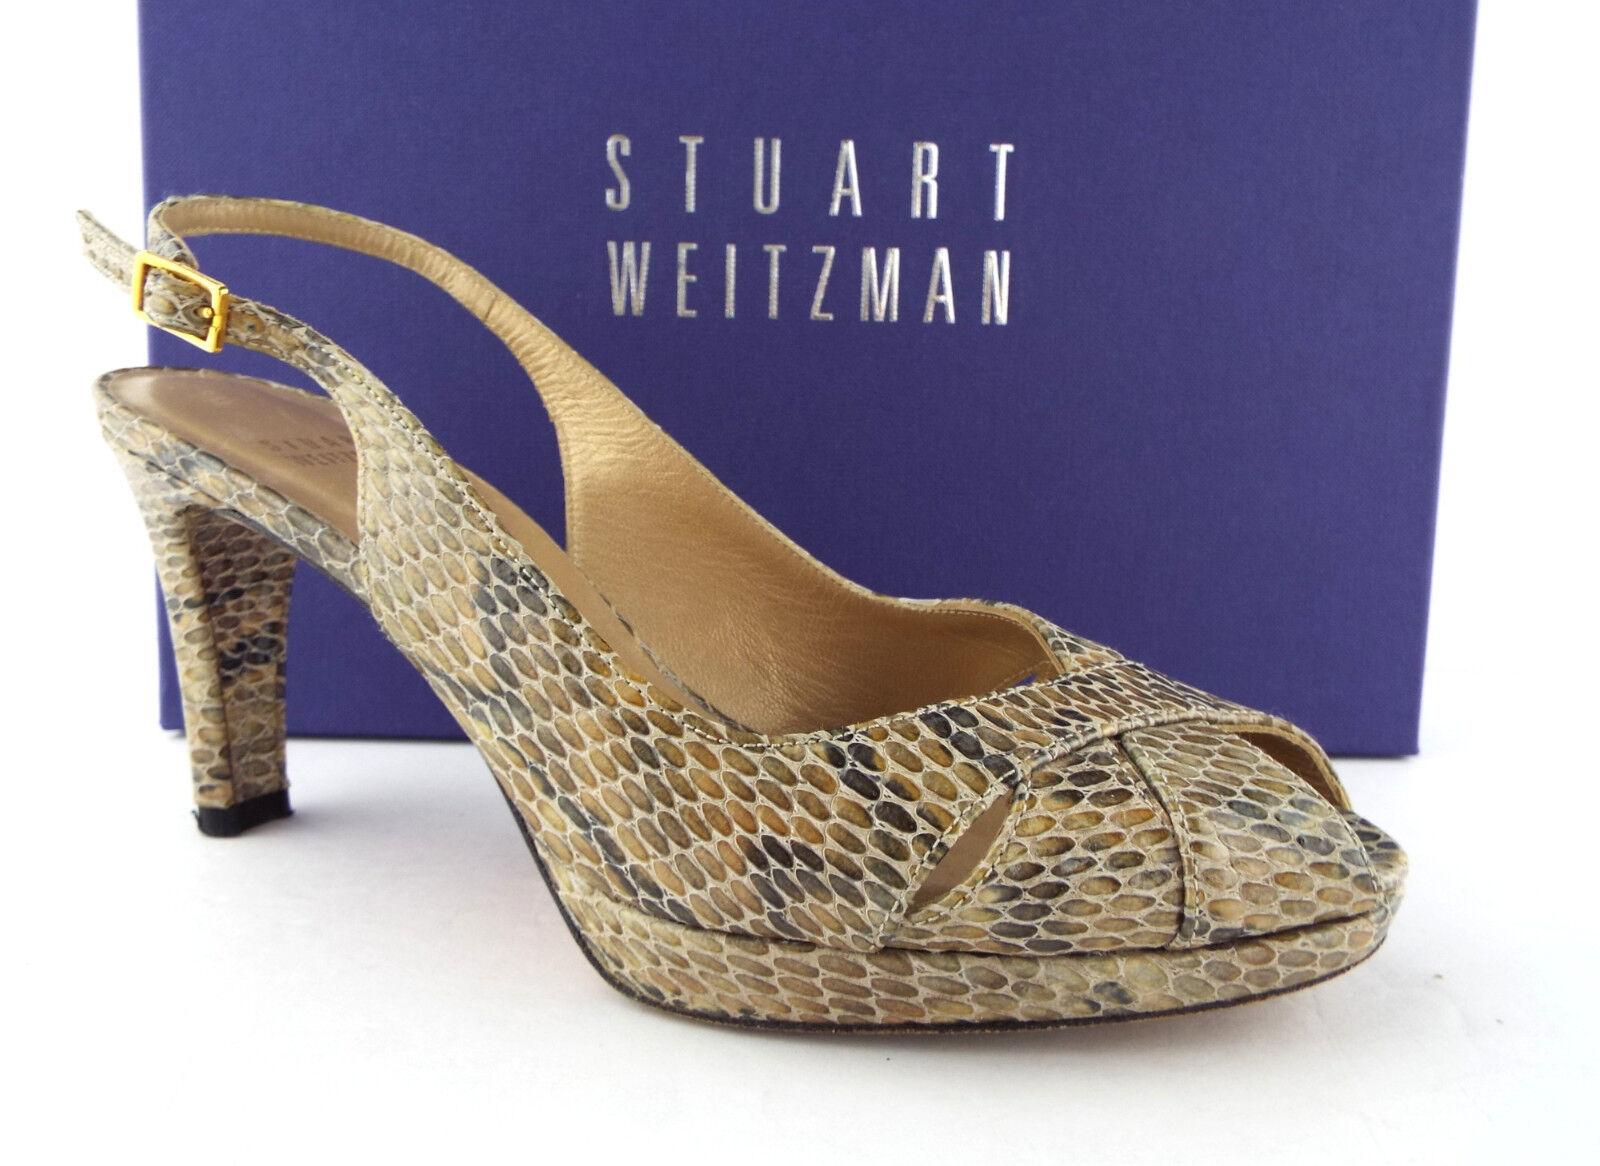 STUART WEITZMAN Size 7.5 Beige Crystal Snake Slingback Heels Pumps Shoes 7 1/2